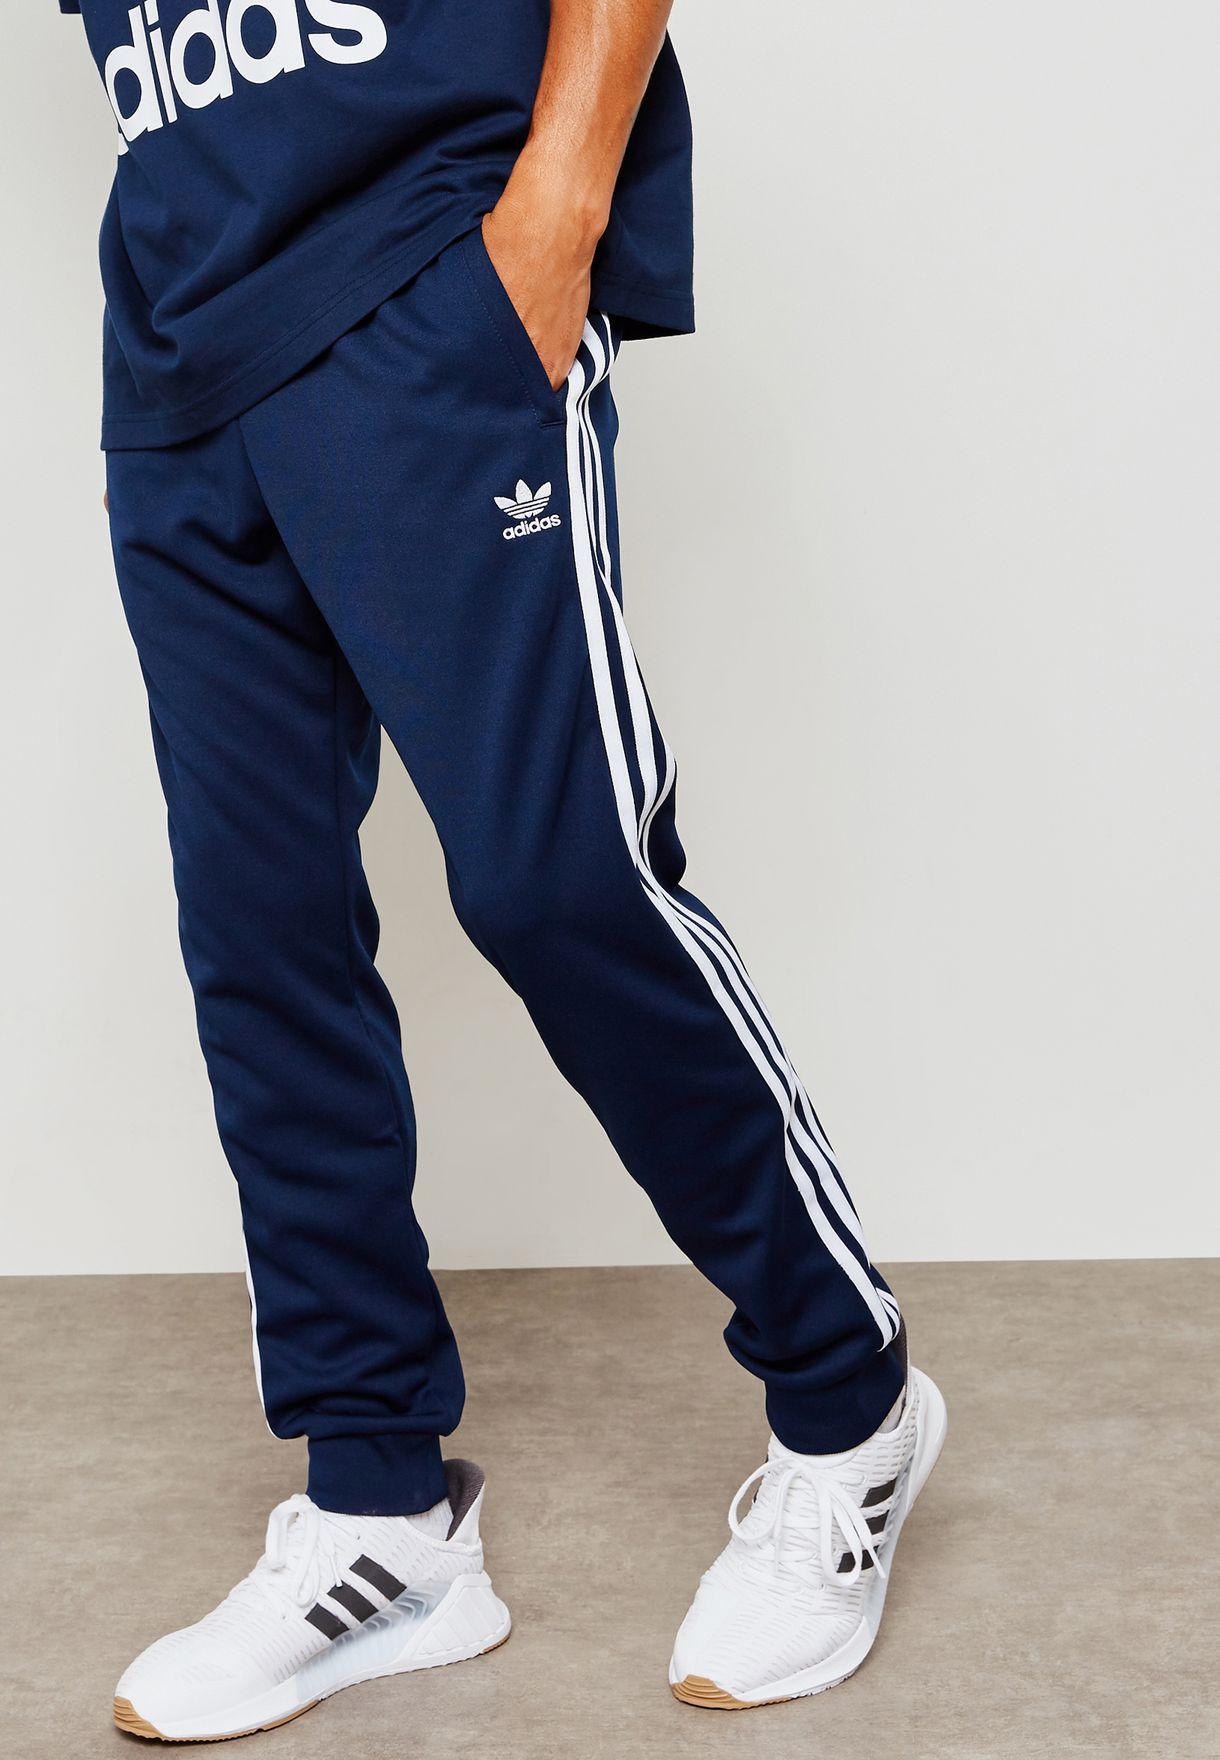 buy popular df155 e7f7e adicolor Superstar Sweatpants